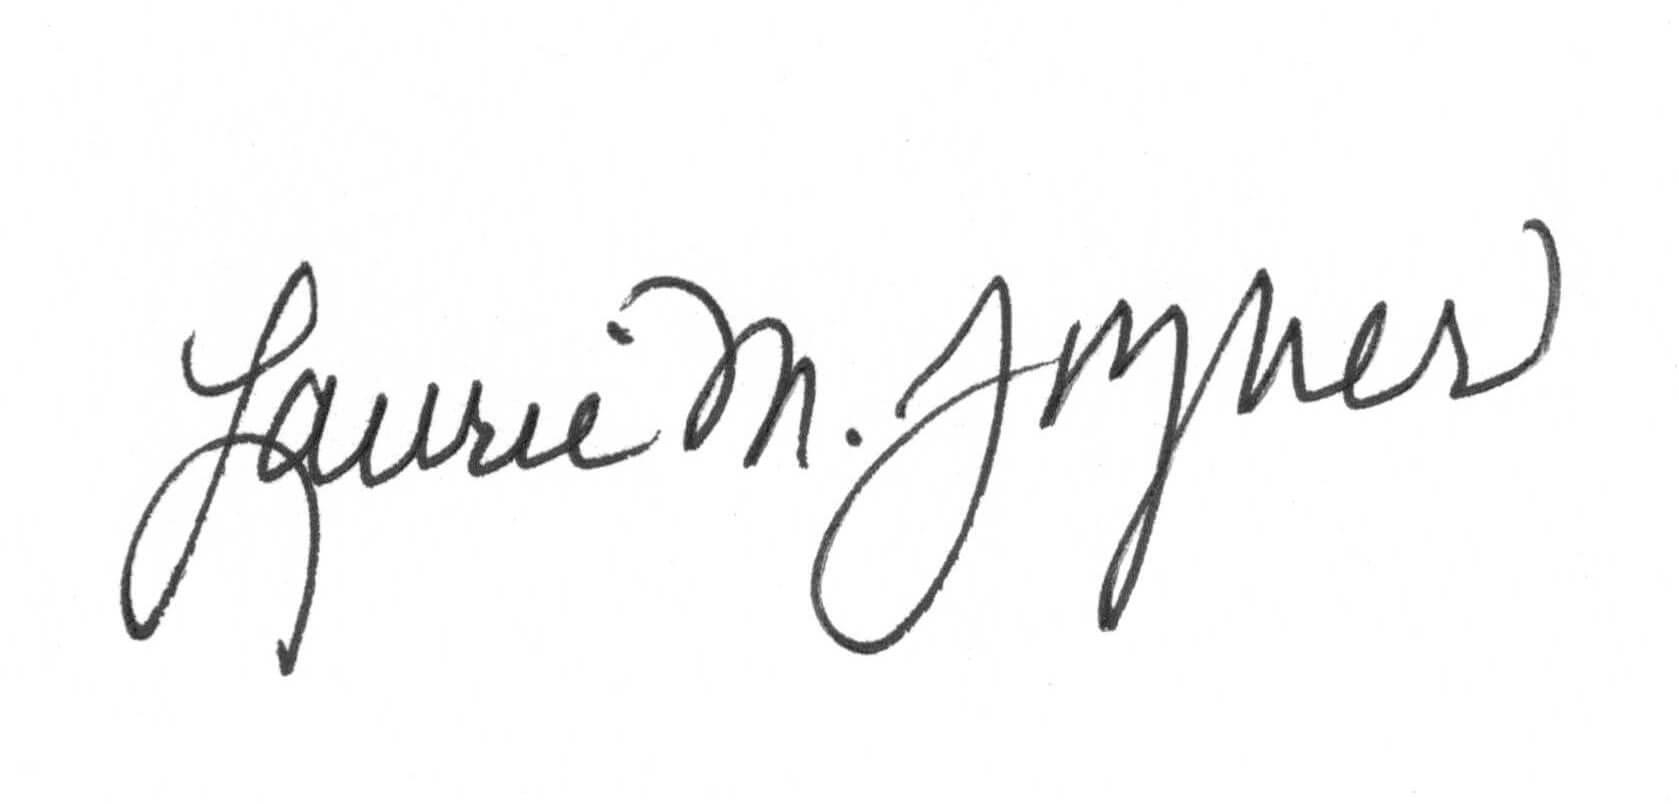 President Laurie M. Joyner, Ph.D. signature